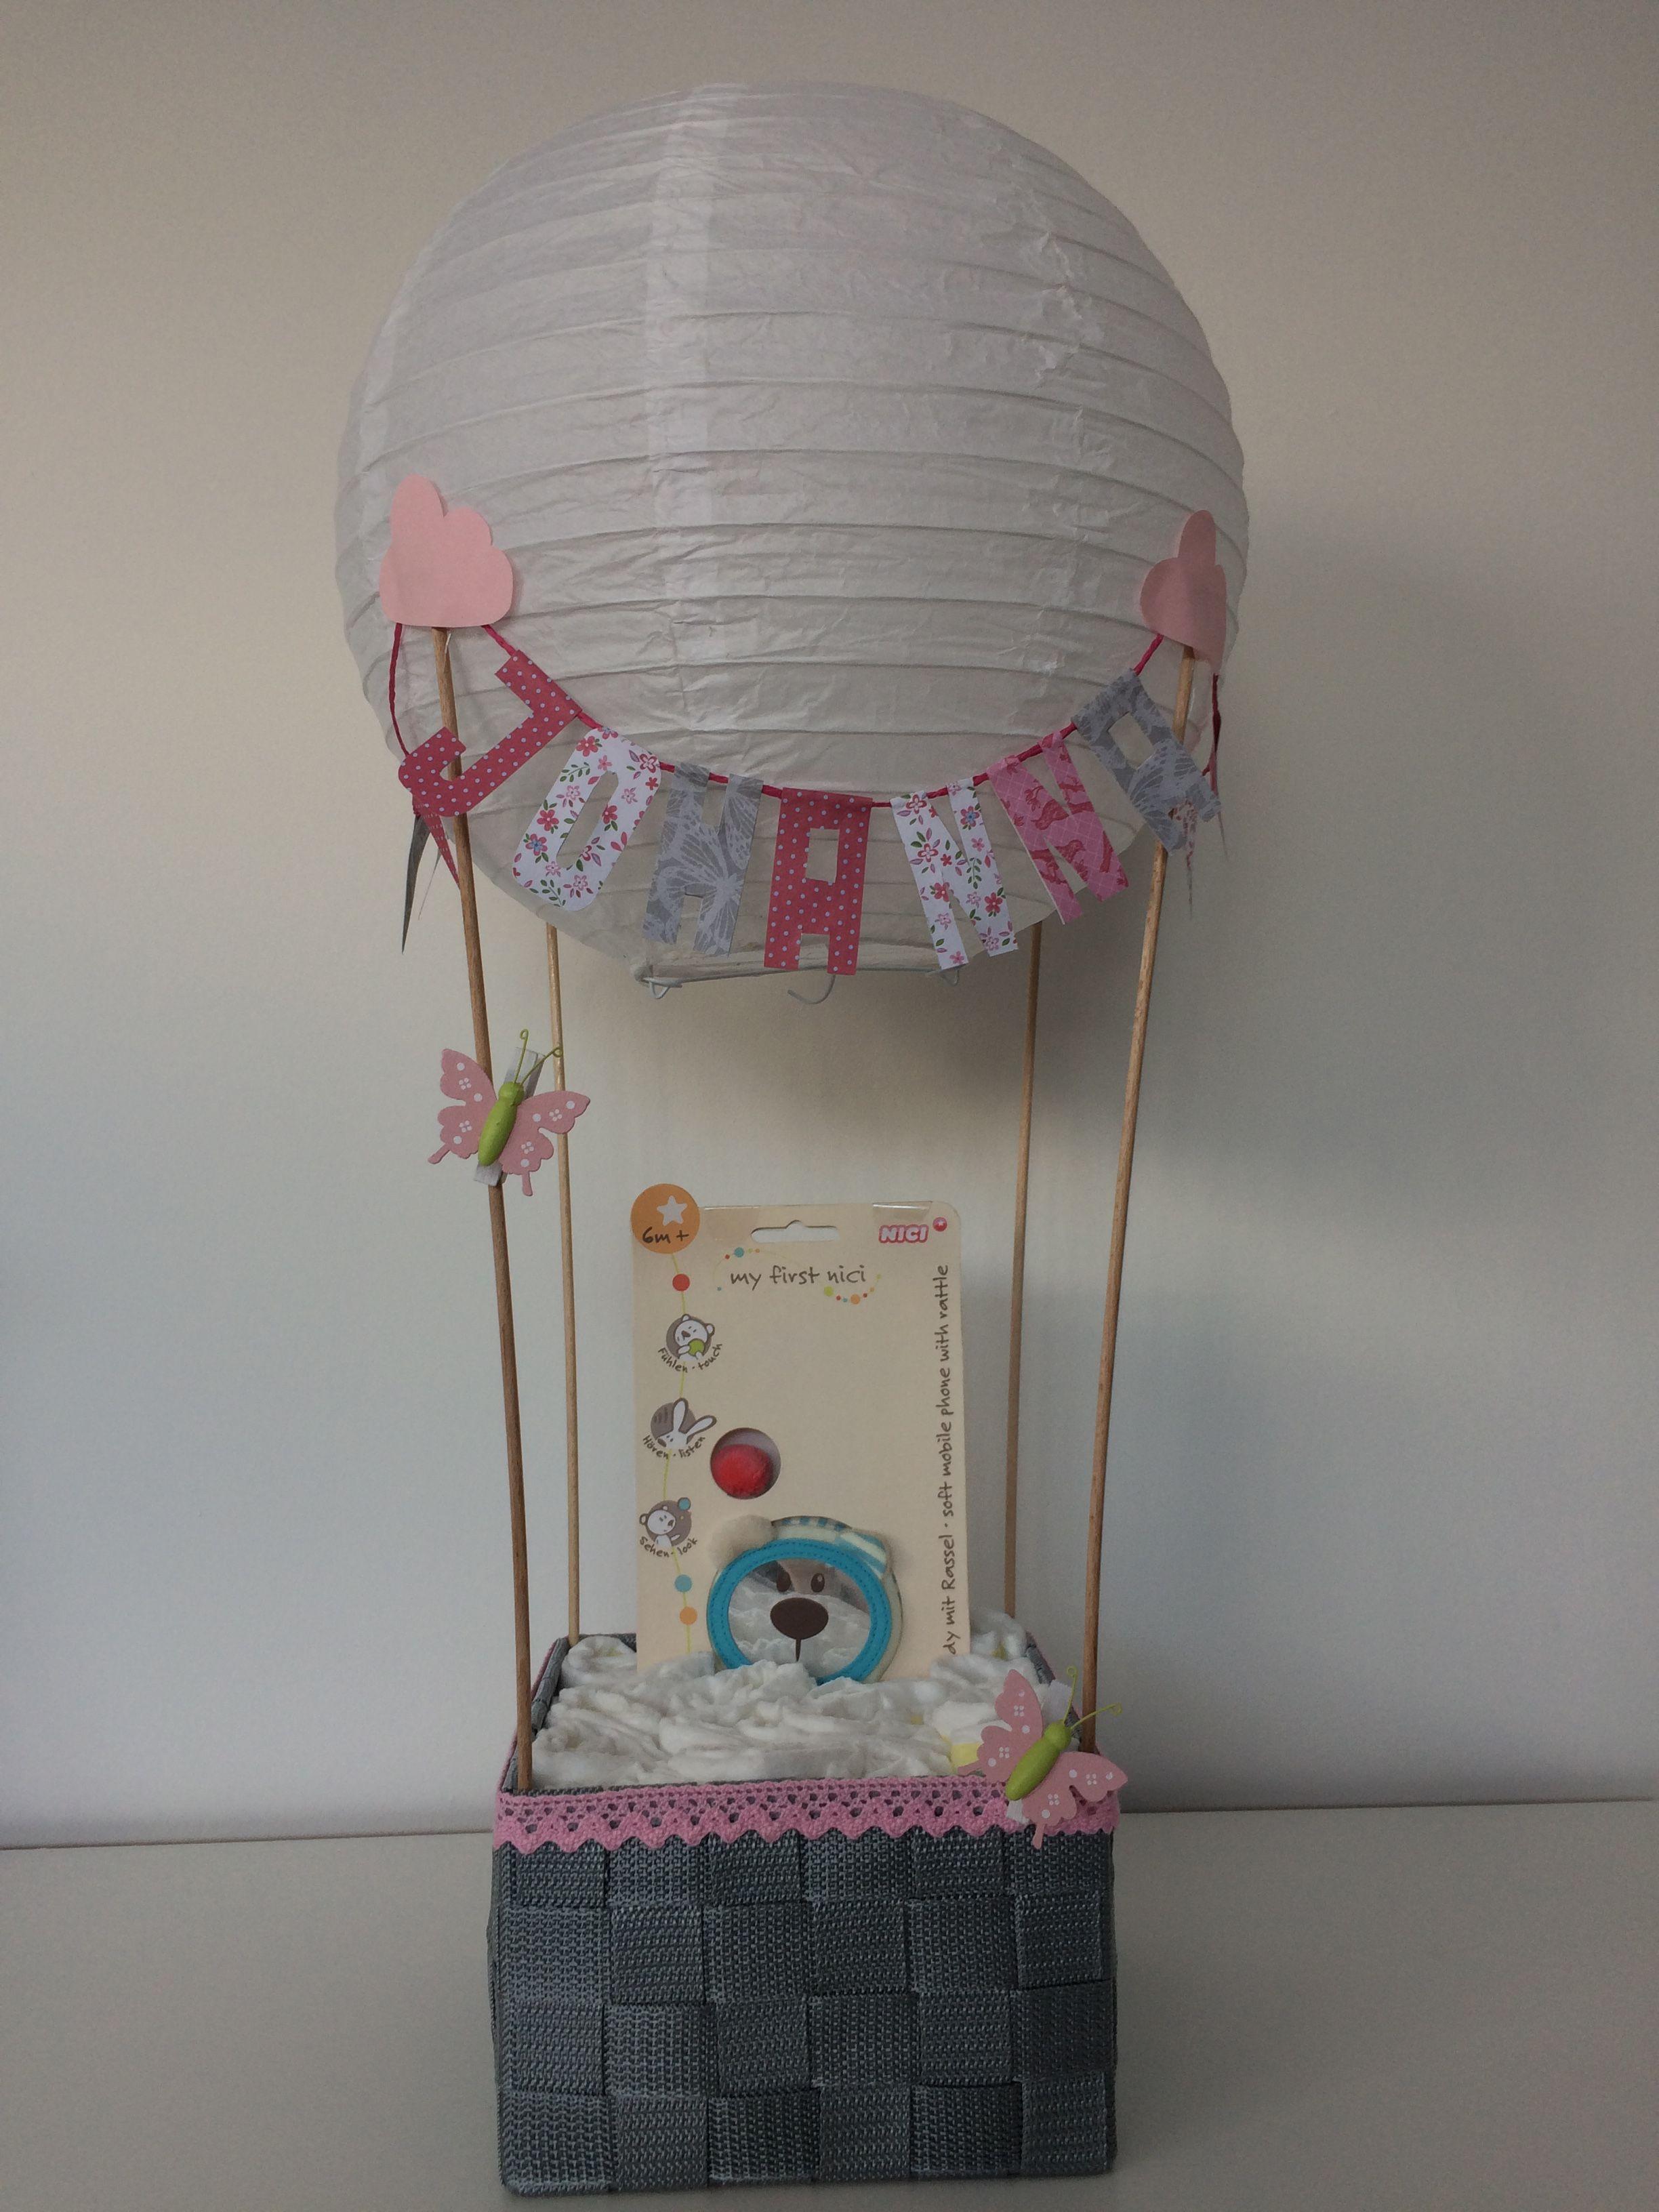 hei luftballon als geschenk zur geburt geschenk zur geburt pinterest babies. Black Bedroom Furniture Sets. Home Design Ideas